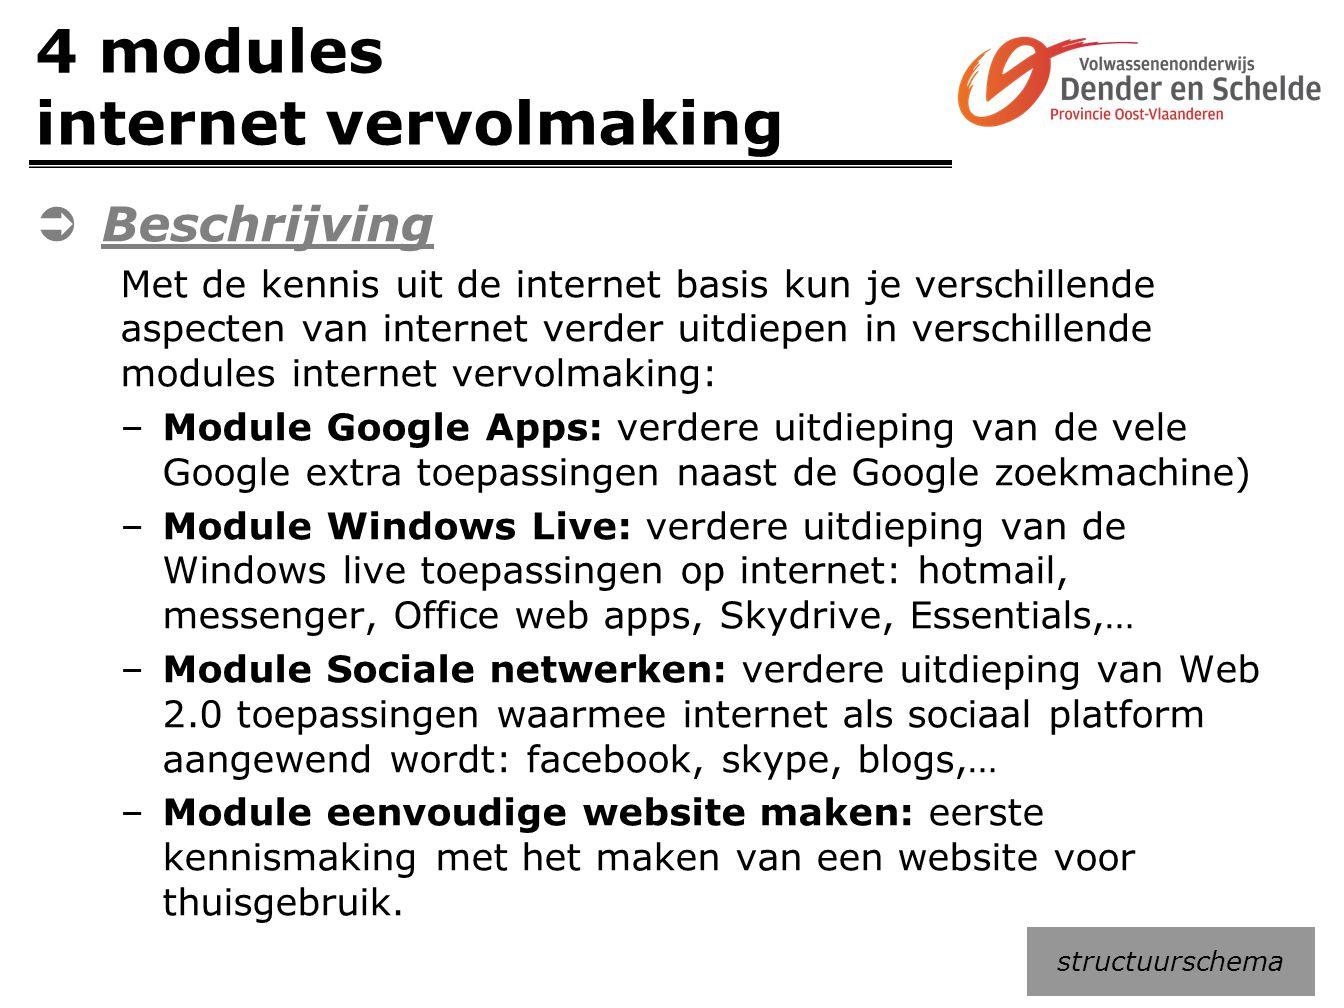 4 modules internet vervolmaking